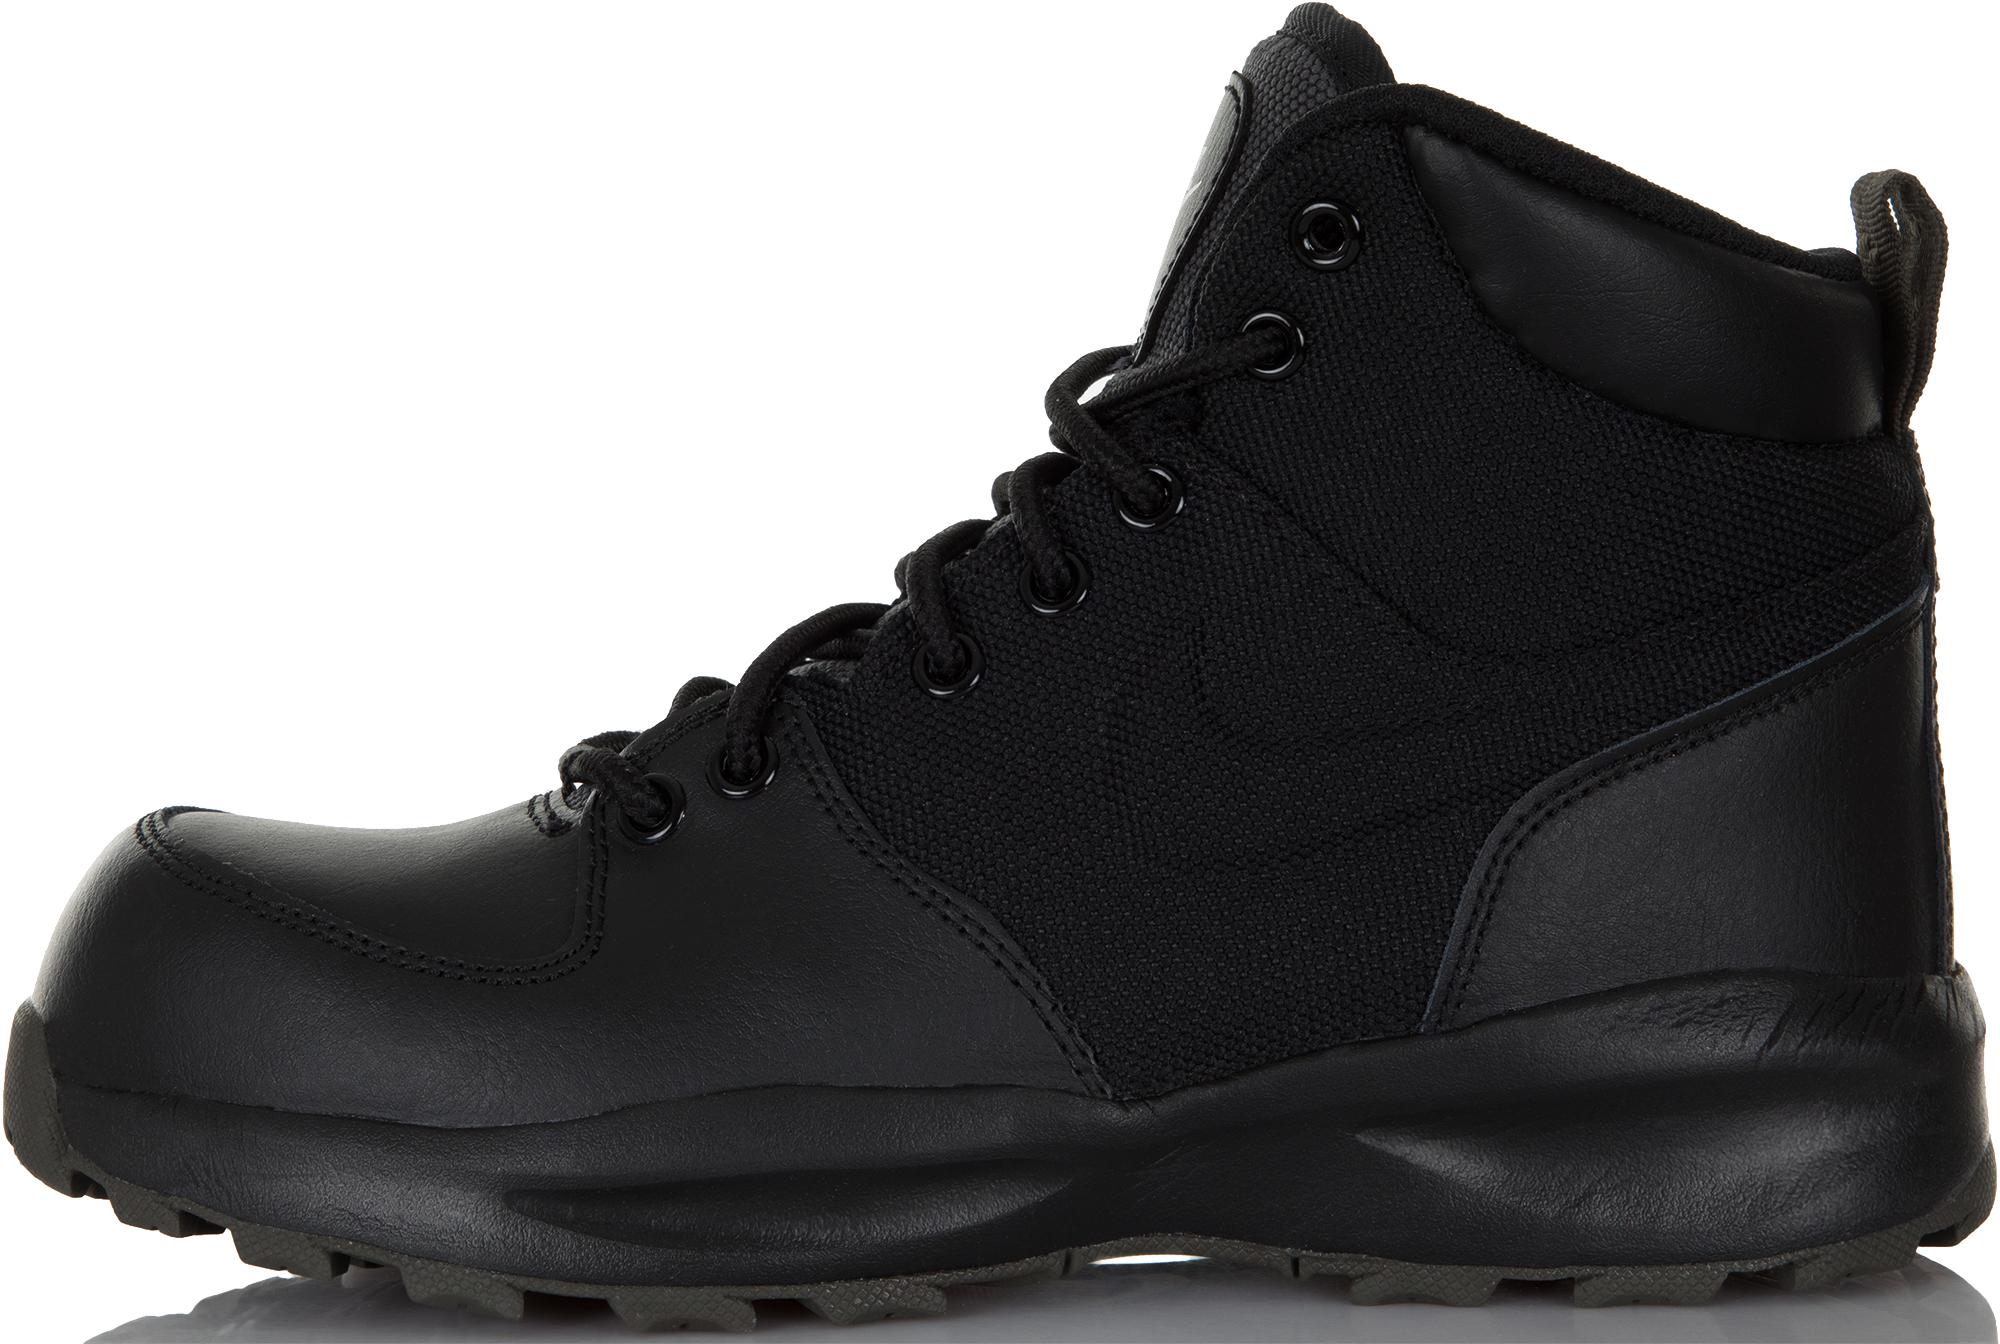 Nike Ботинки для мальчиков Nike Manoa 17 (GS), размер 37 цена 2017